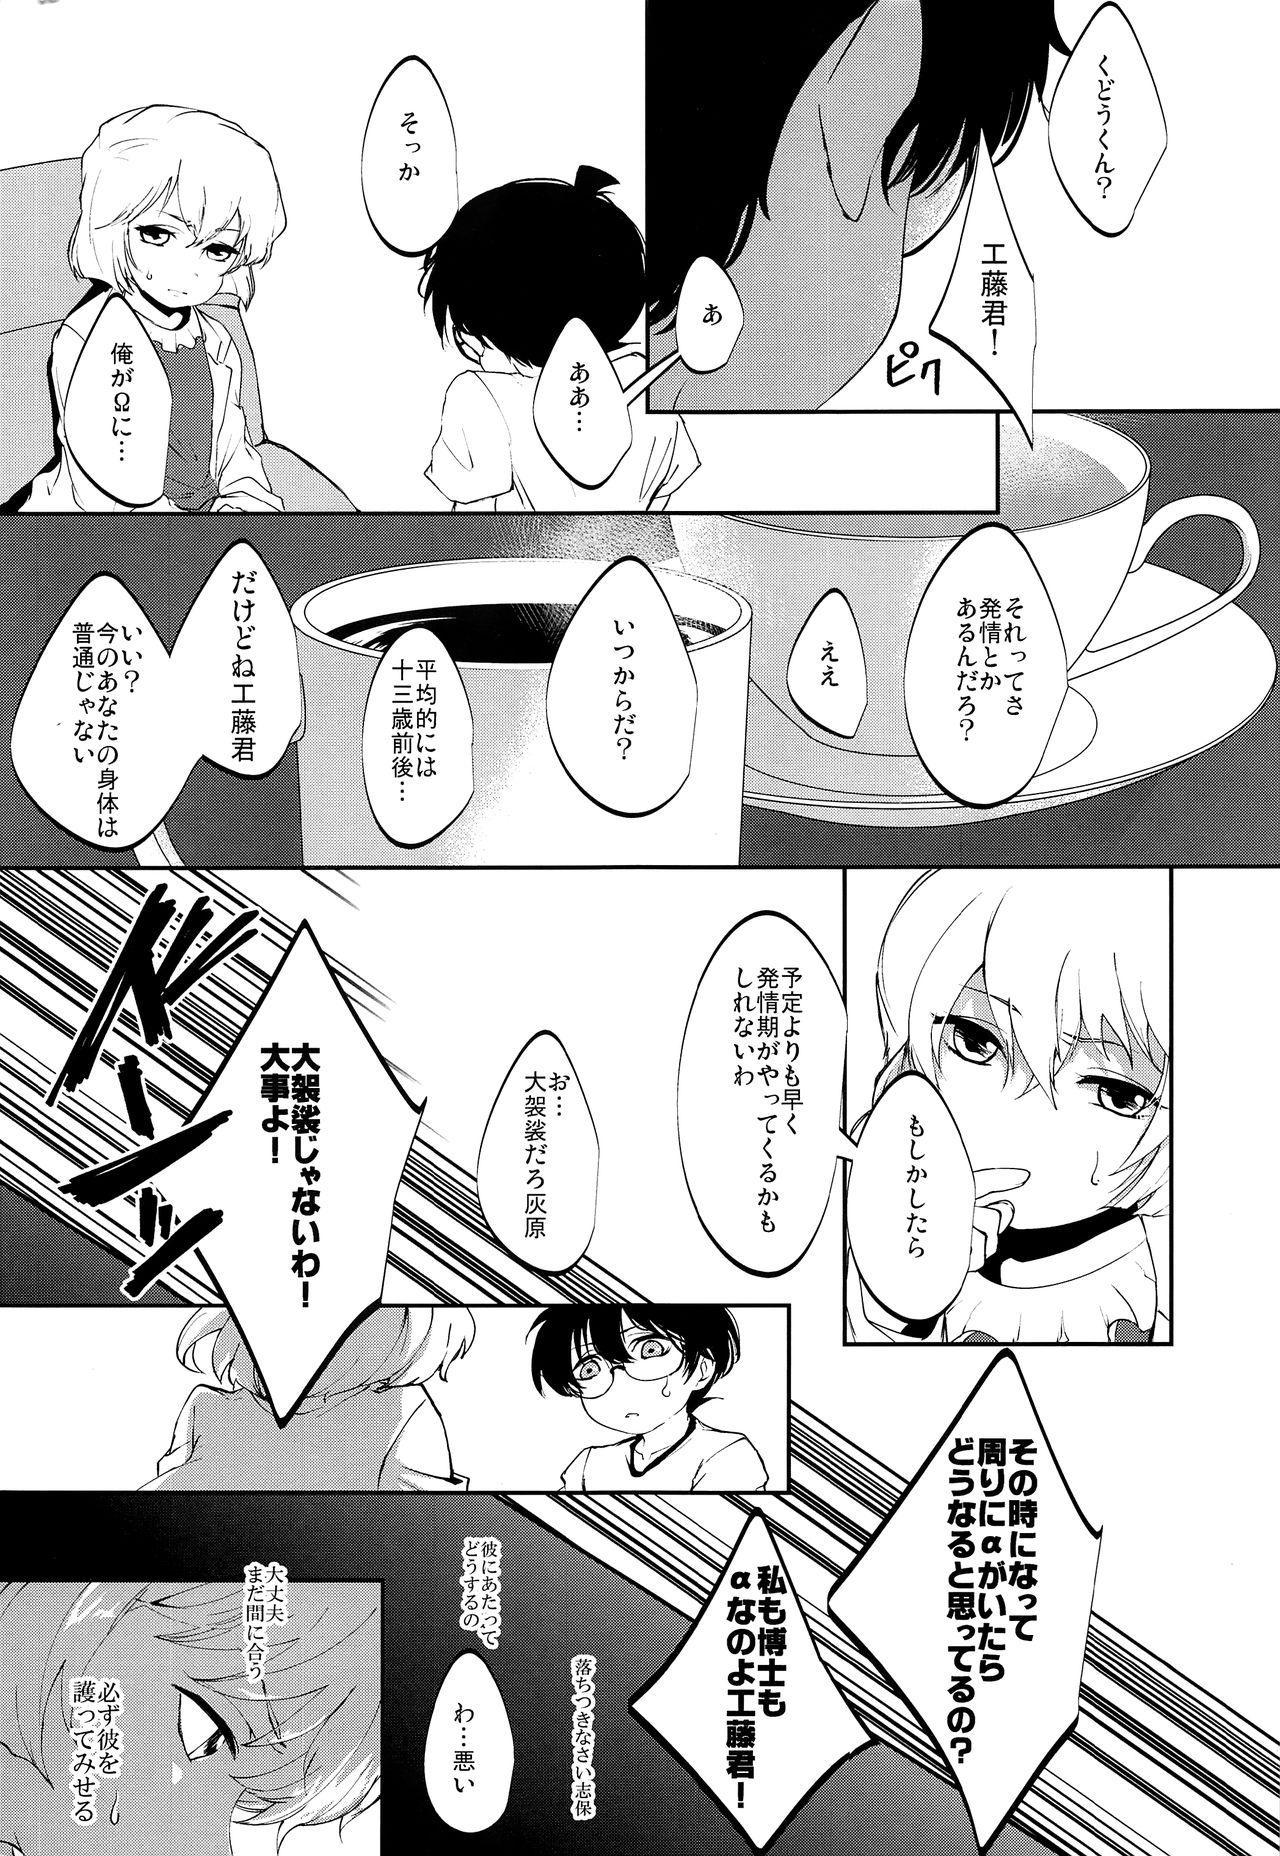 Kawaki 5